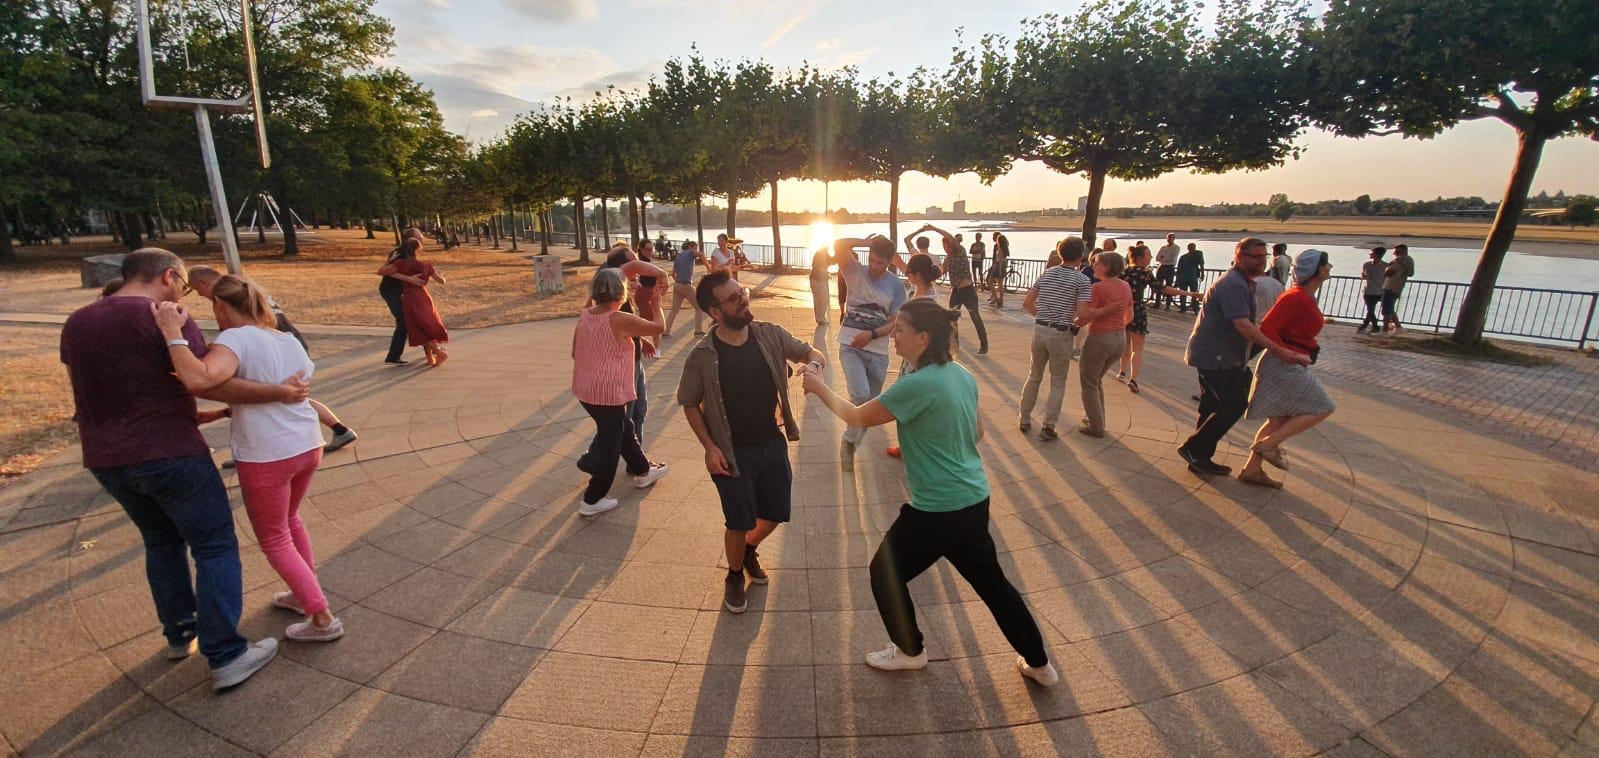 SummerTent-JKJ2021-Jugendkultursommer-lindy-hop-dance-tanz